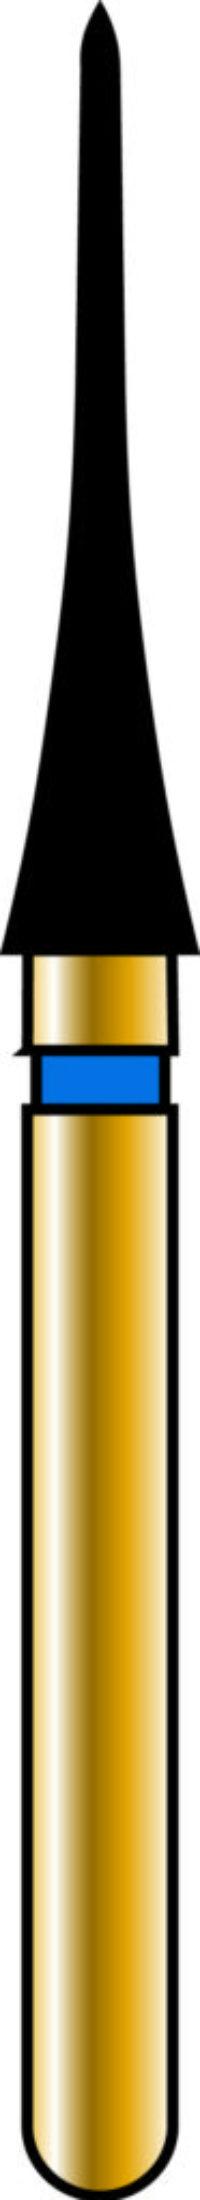 Interproximal 21-10mm Gold Diamond Bur